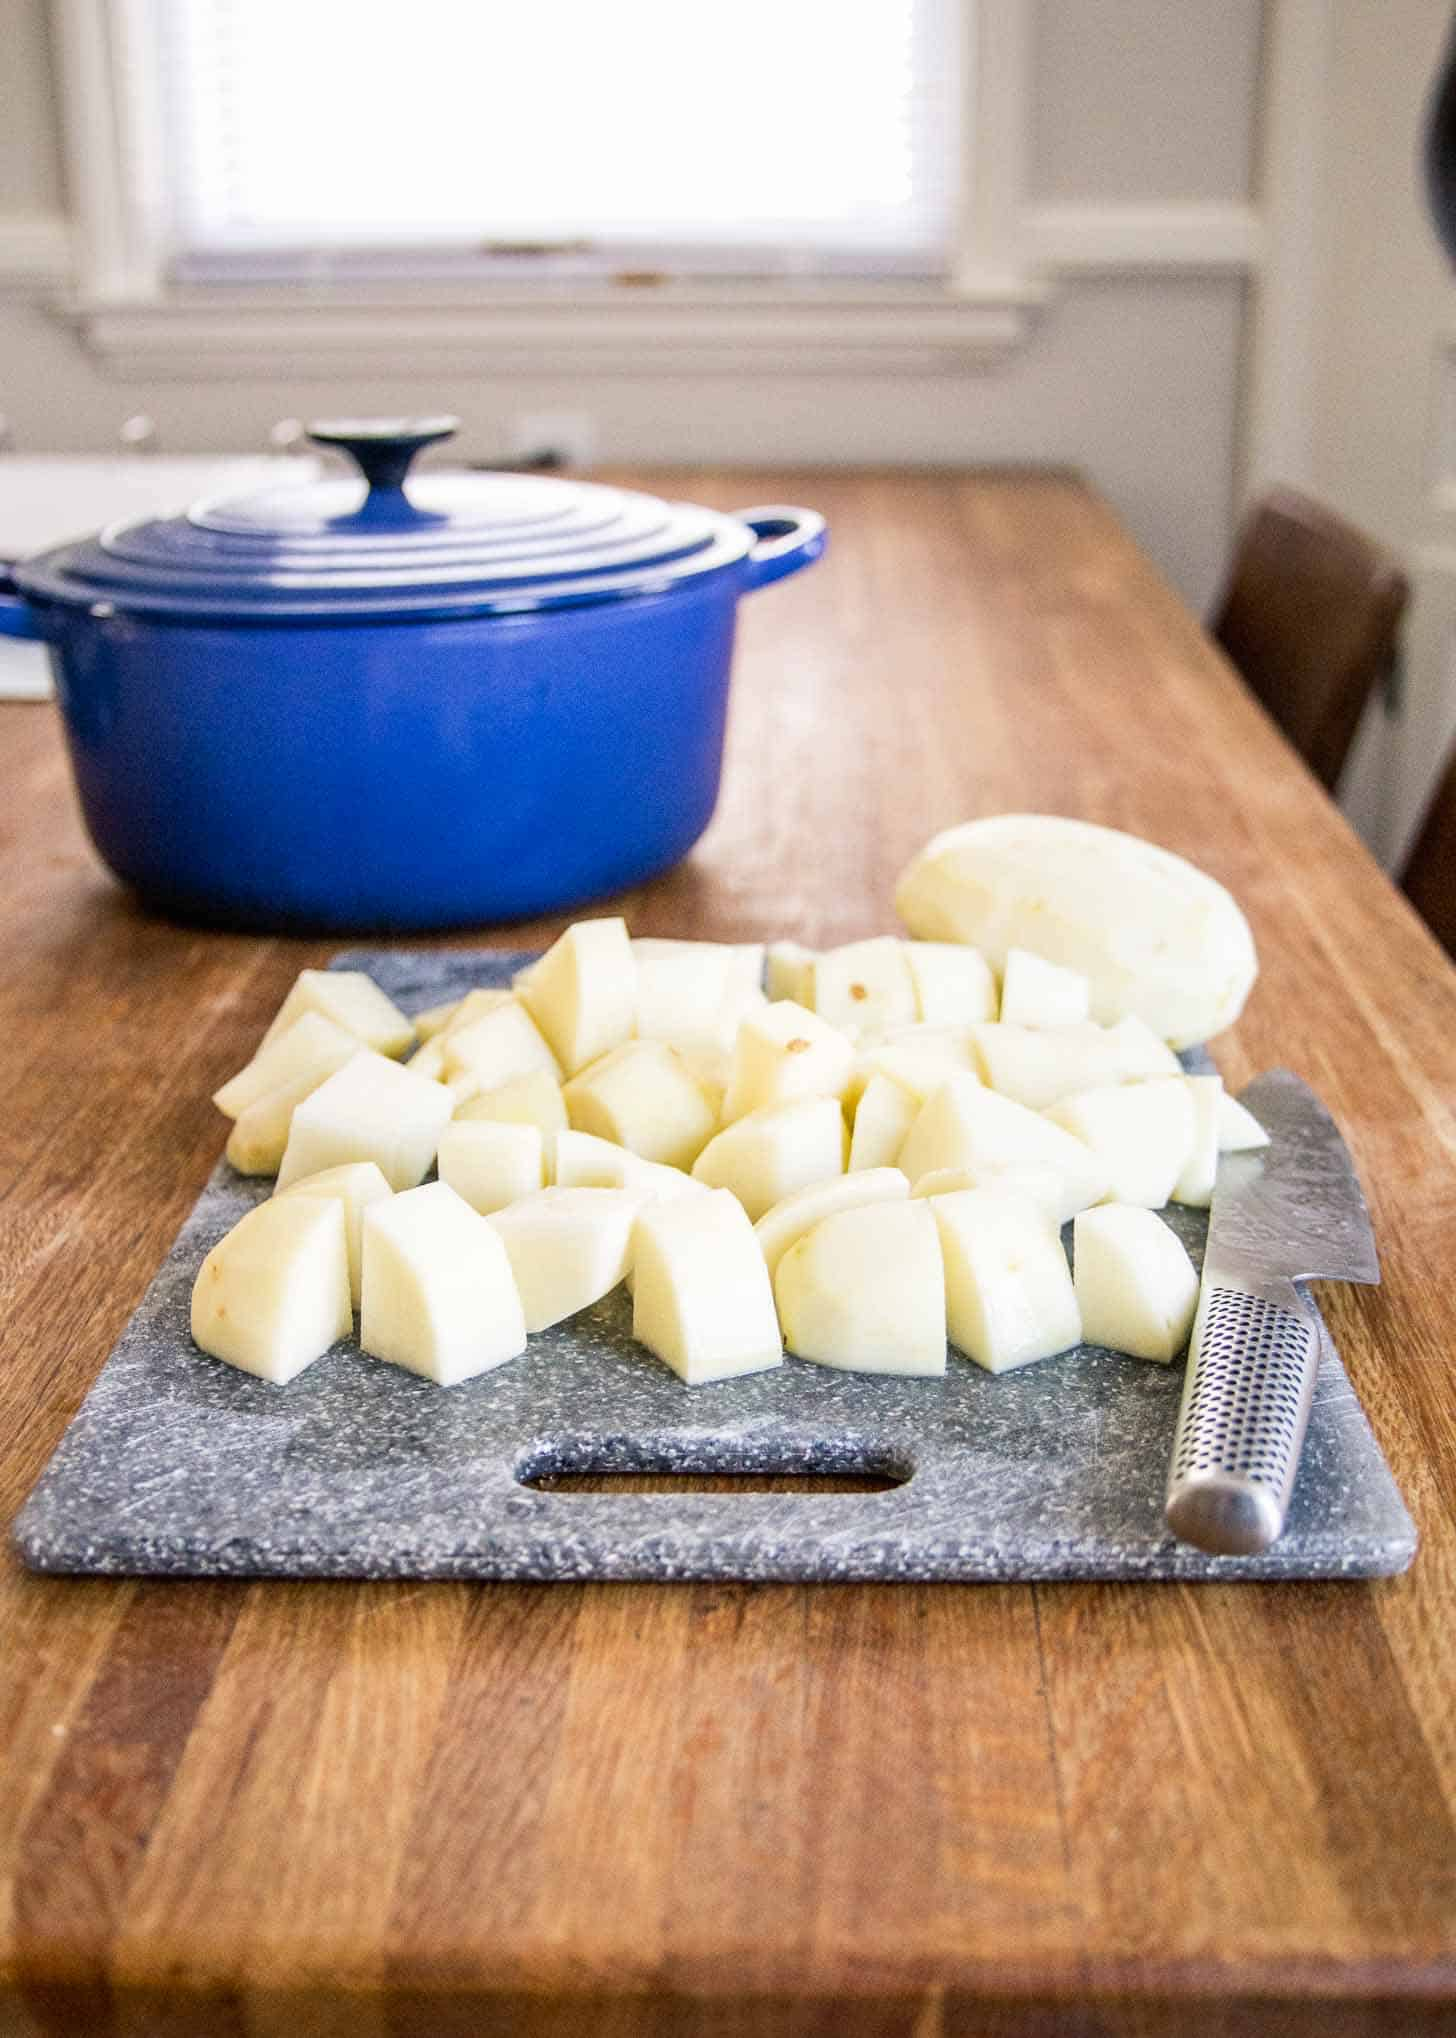 cutting potatoes on a cutting board